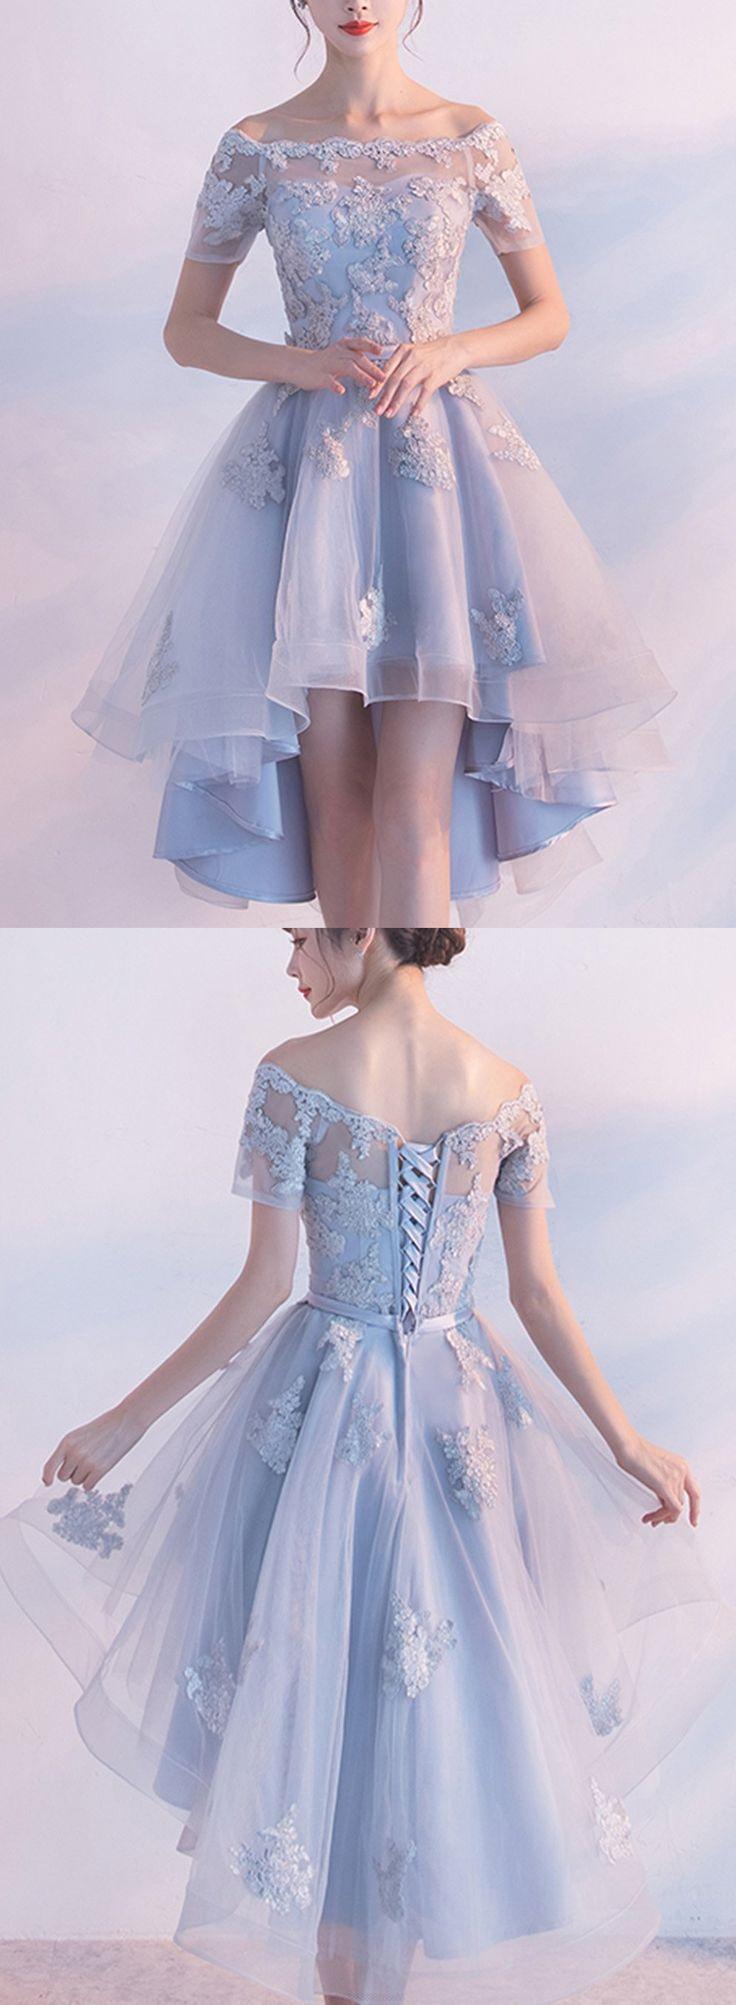 Short light blue prom dress